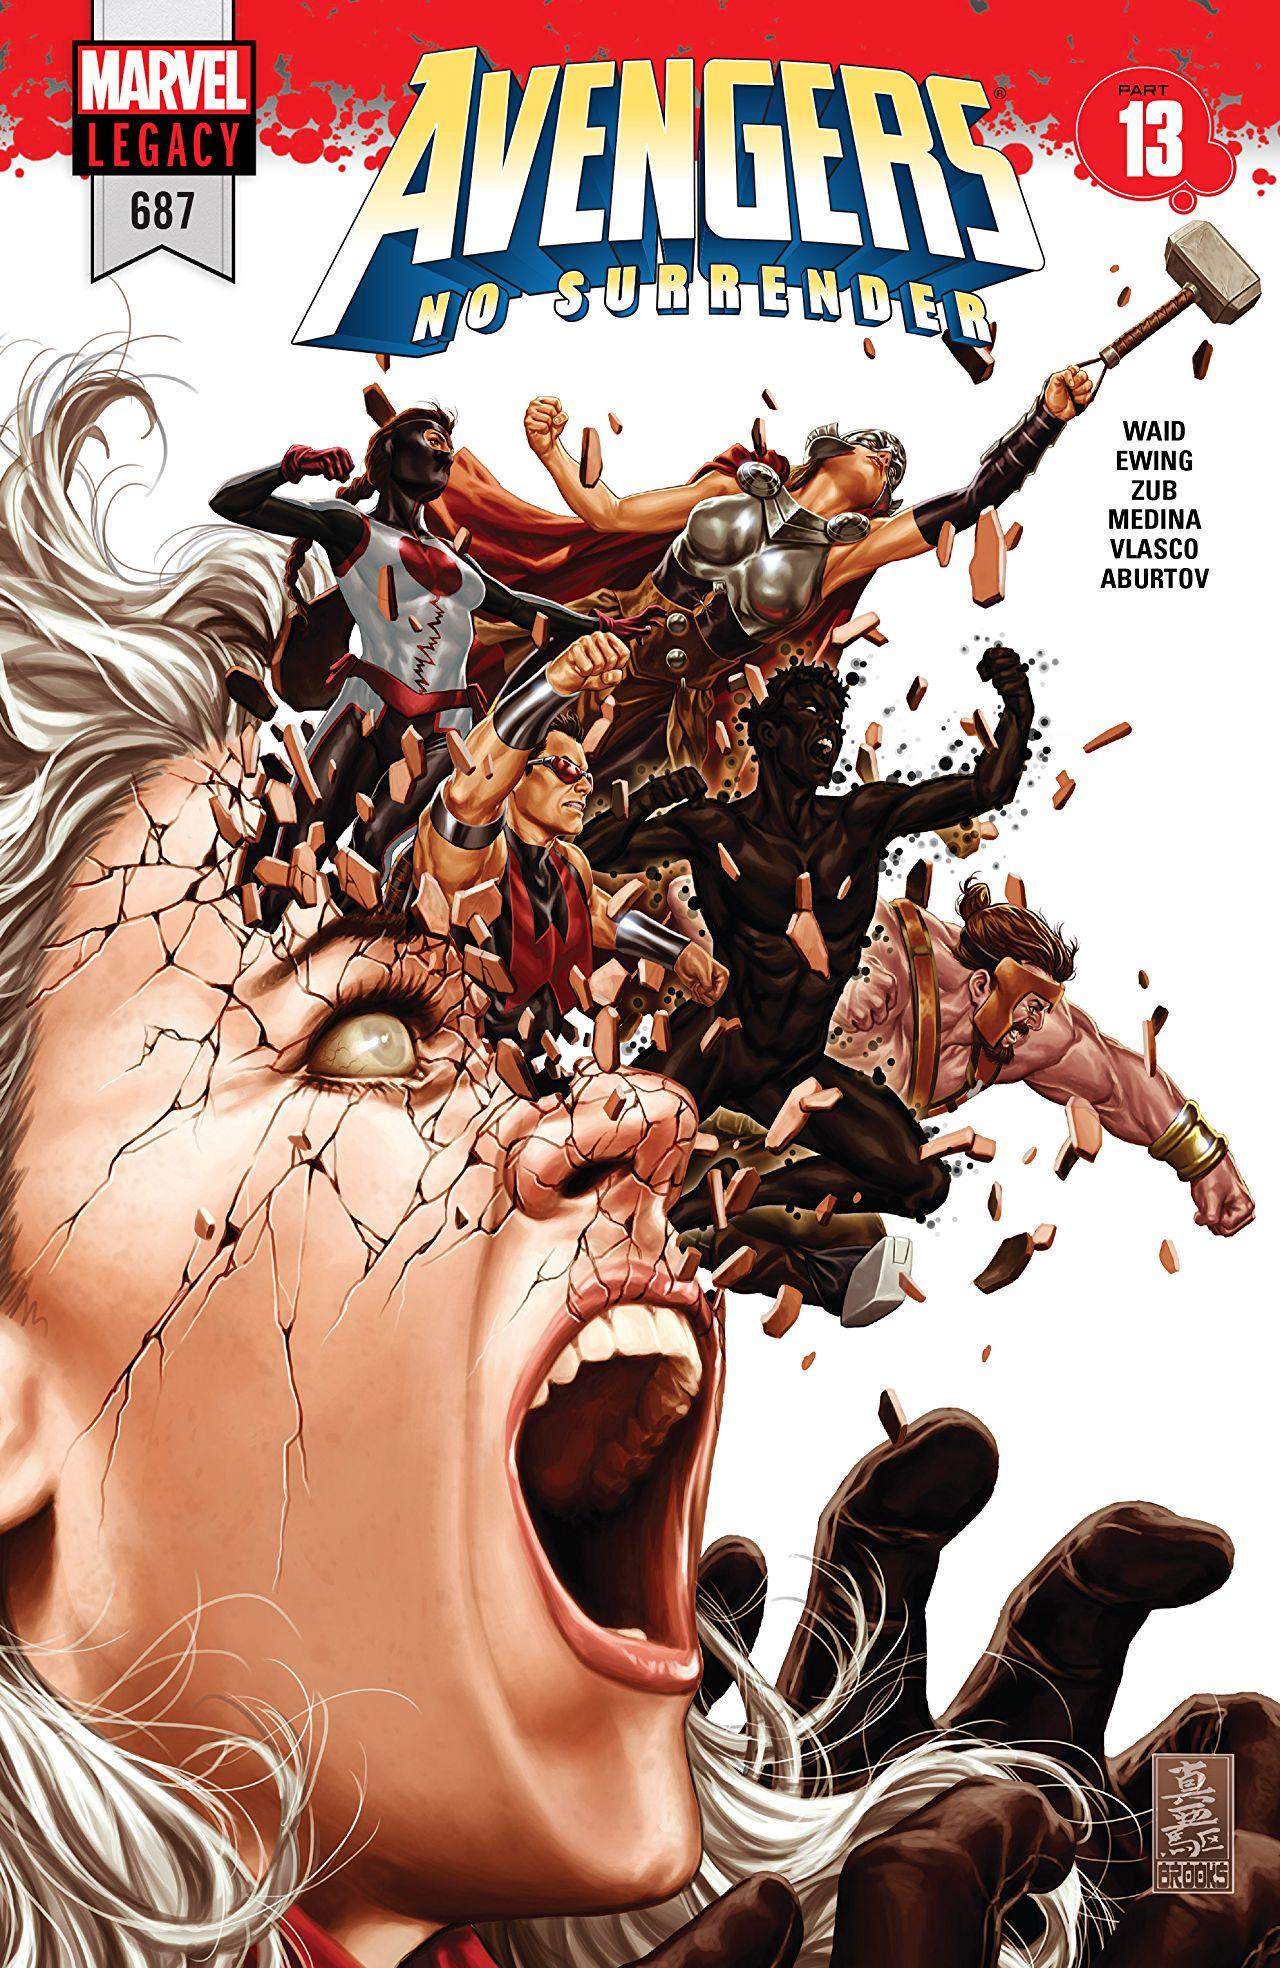 April 4, 2018: Best Comic Book Covers of the Week! | Joseph